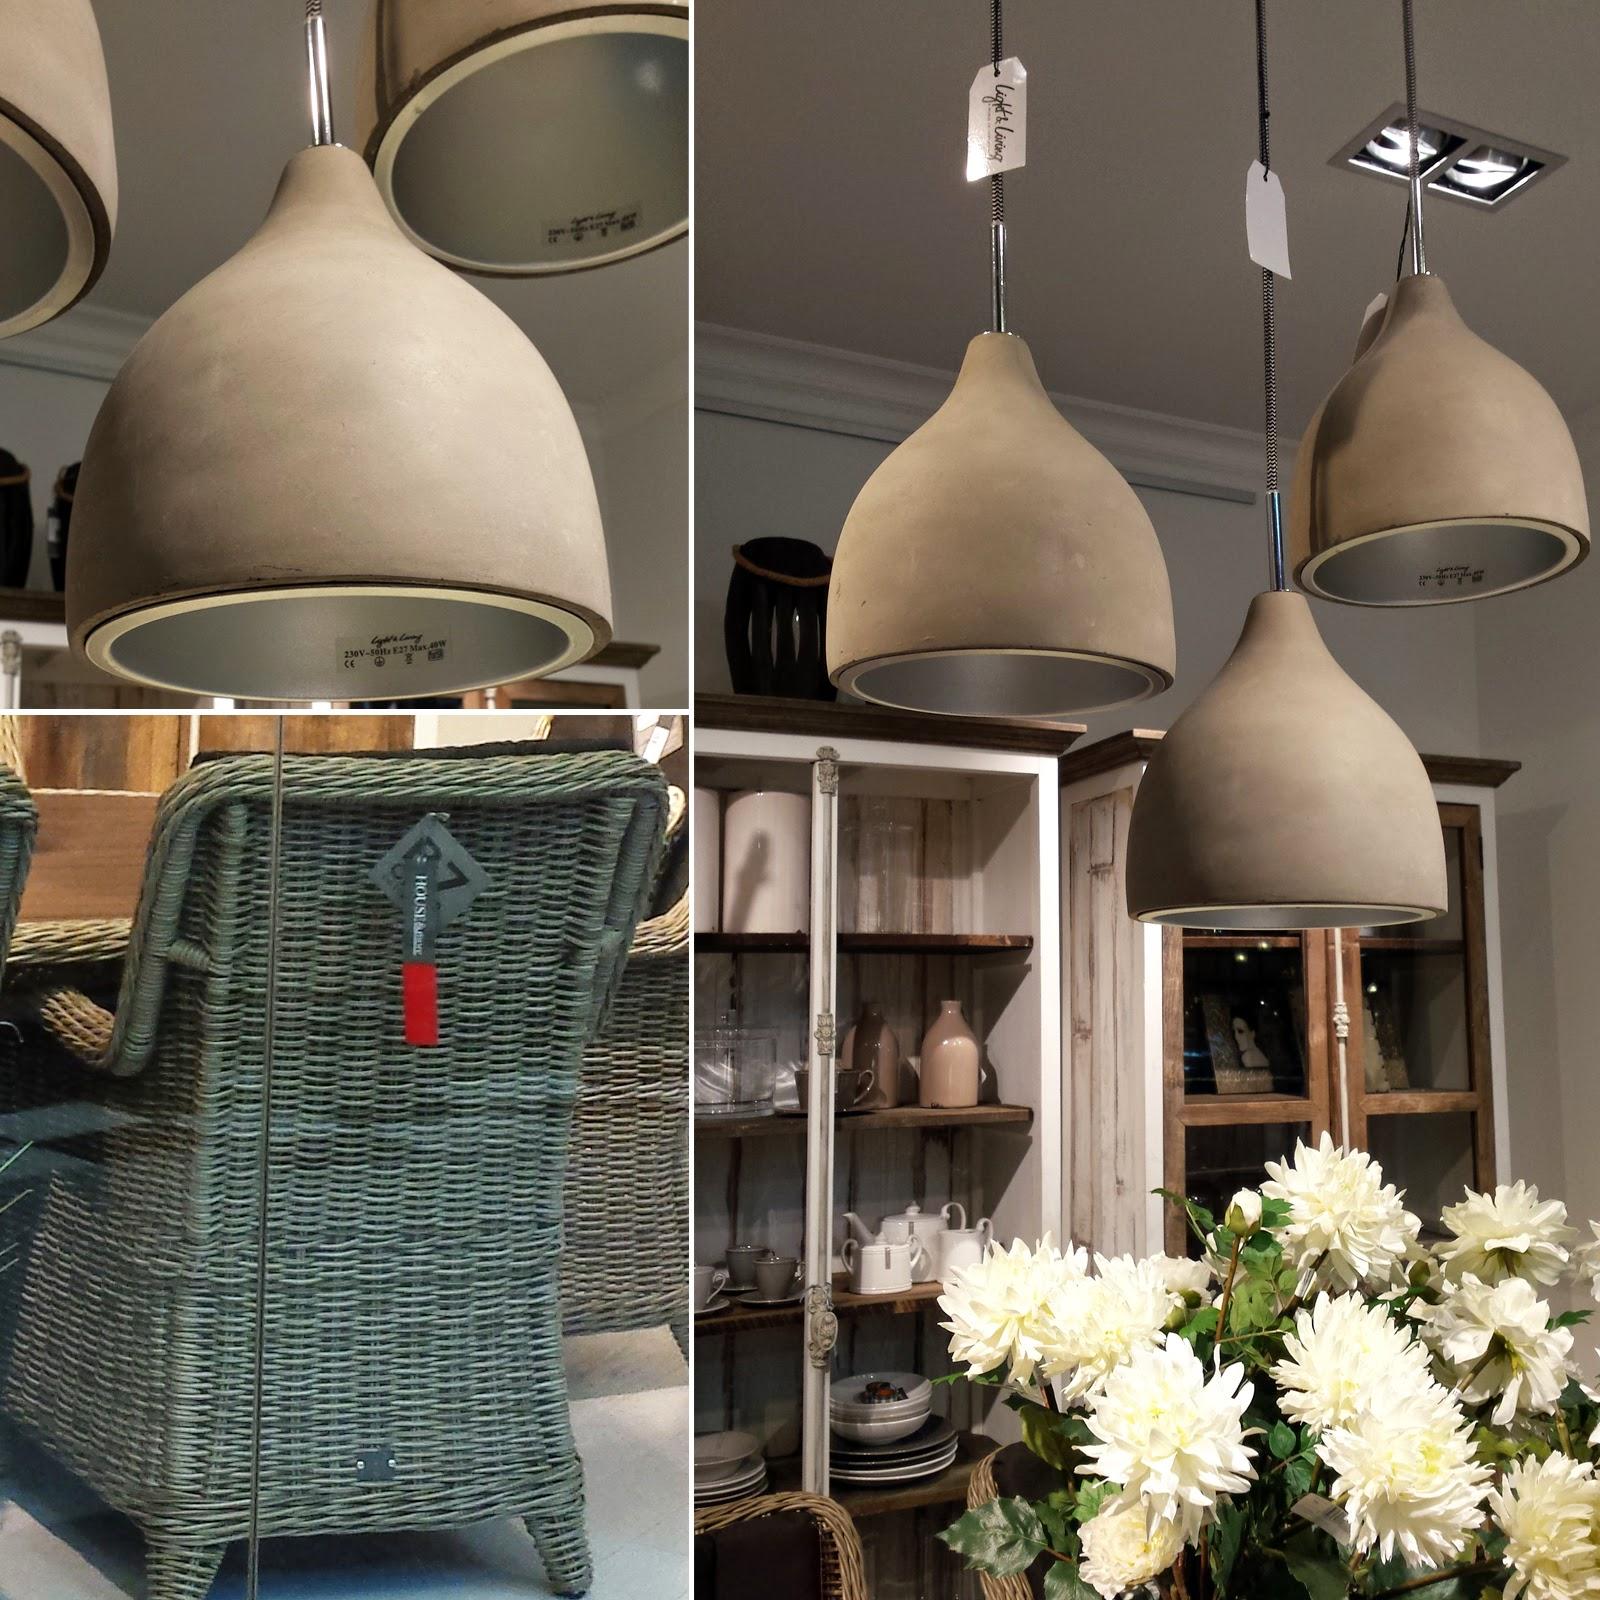 Dacon-Design-interiors-House&More-Miloo-Manutti-Eichholtz-Flamat-Pomax-Riviera Maison-Grand Design-meble skandynawskie-ogrodowe-betonowe-lampy